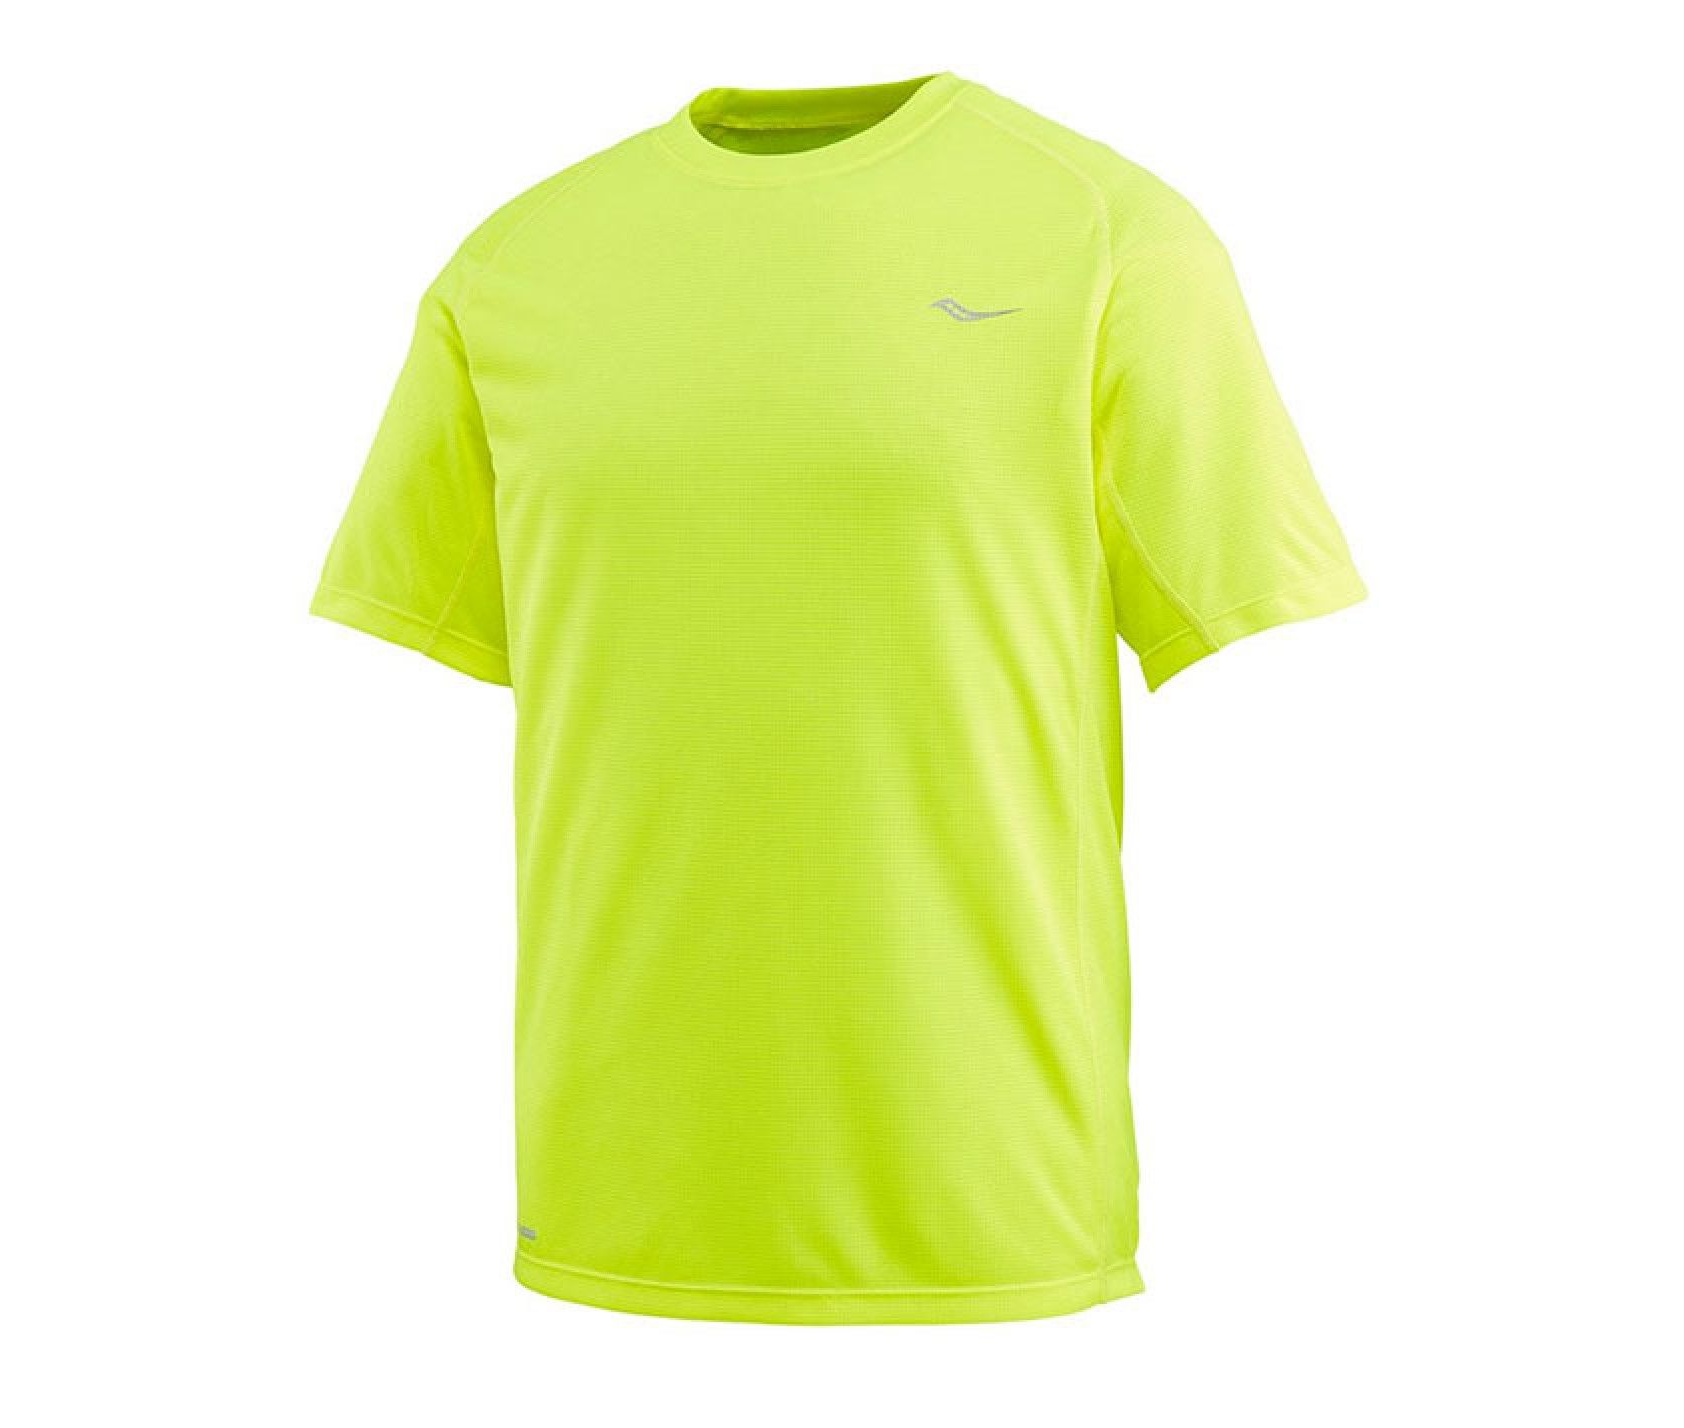 Camiseta running Saucony Hydralite amarilla hombre Deportes Moya